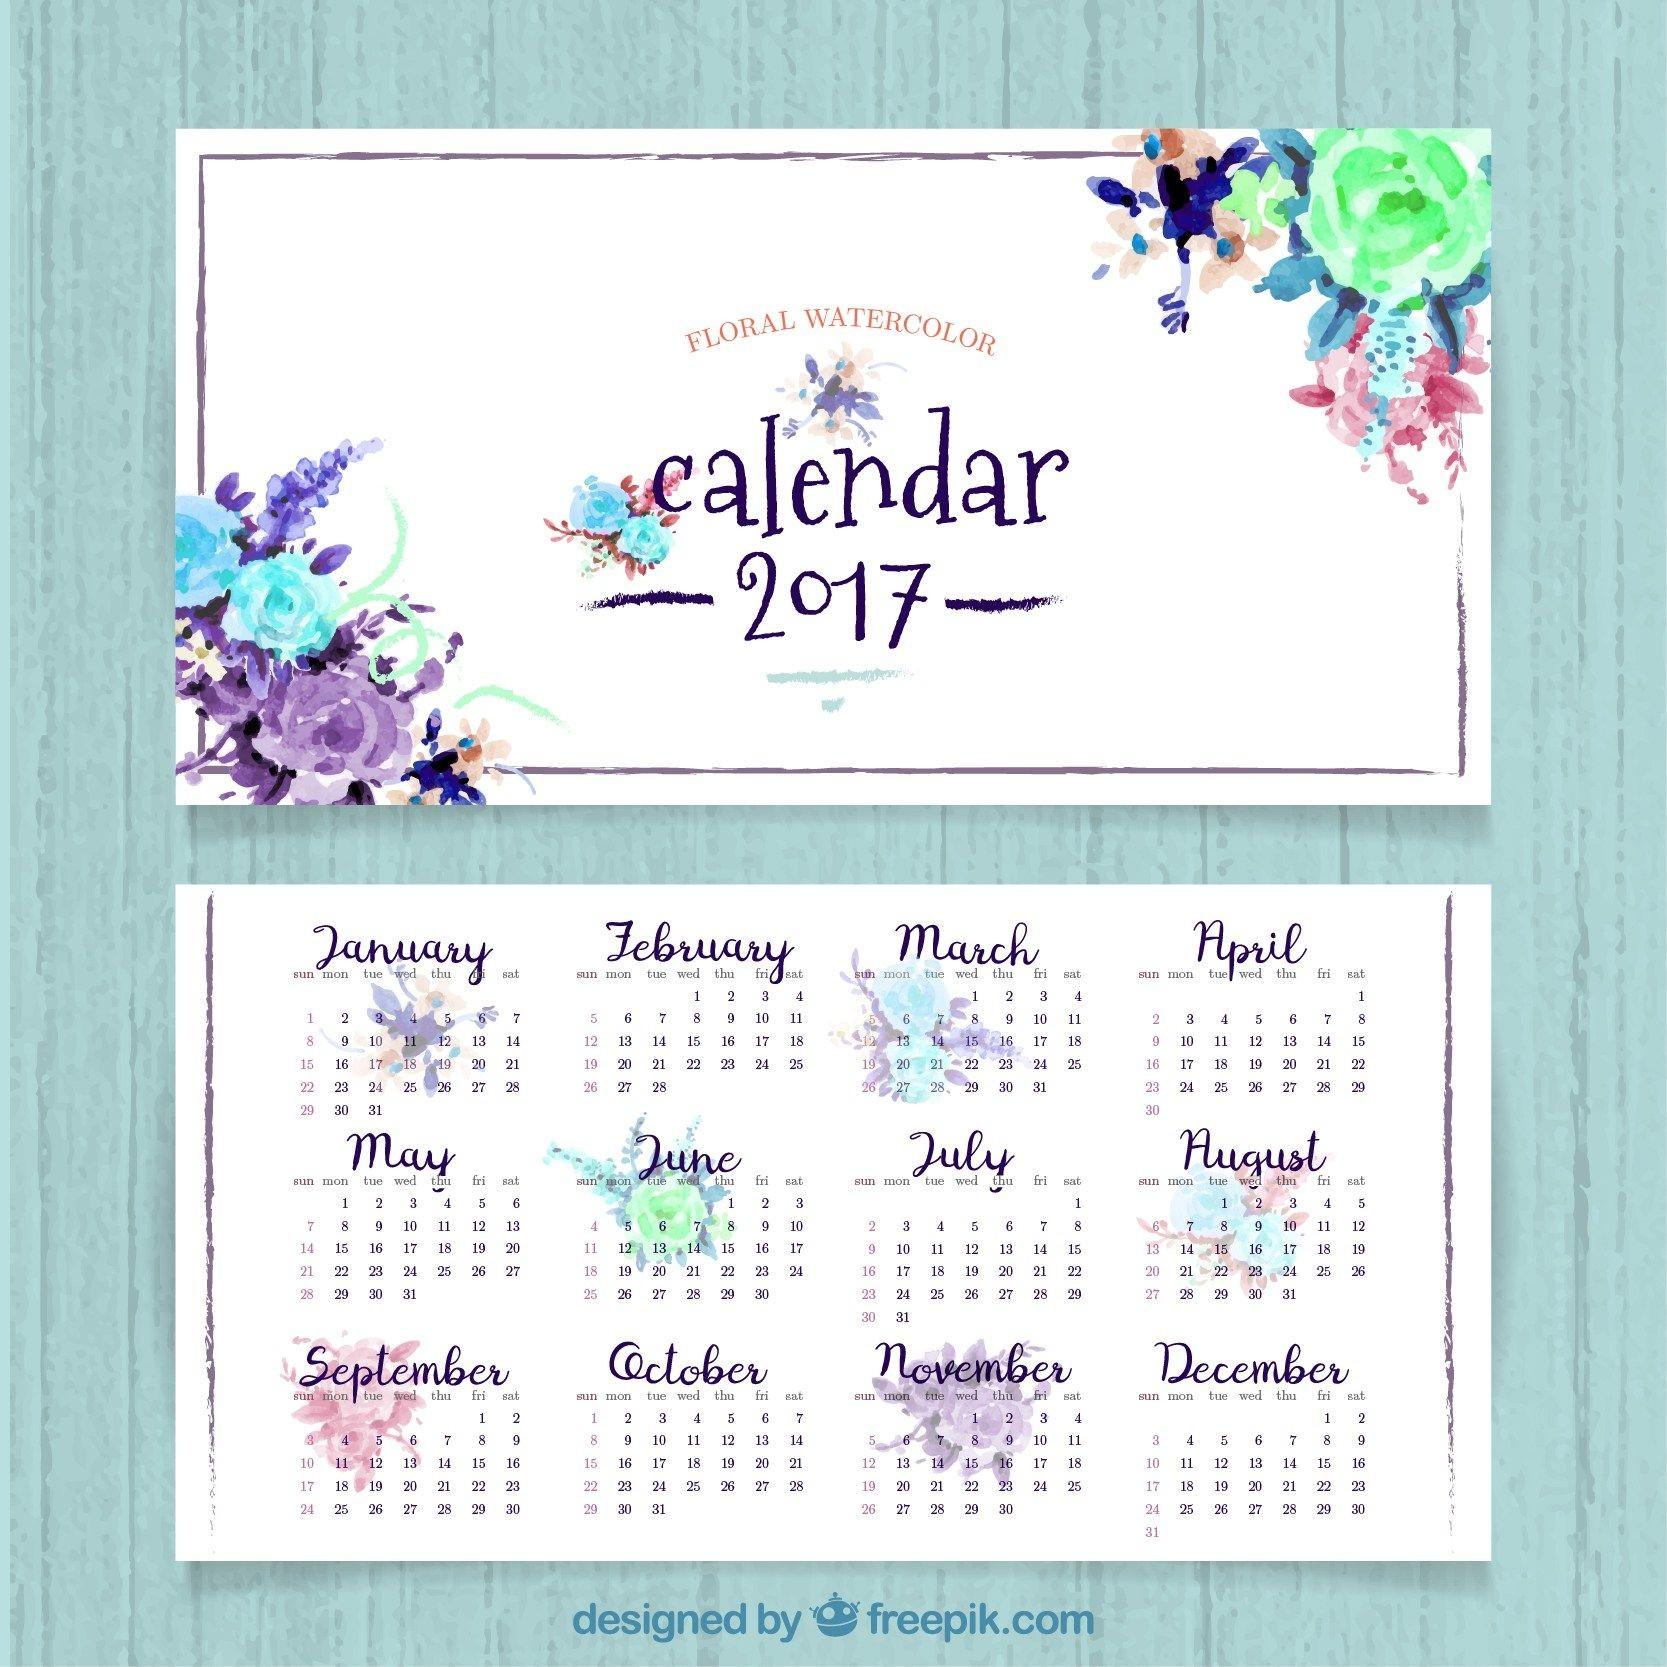 Descarga Este Calendario En Vectores Para Que Puedas